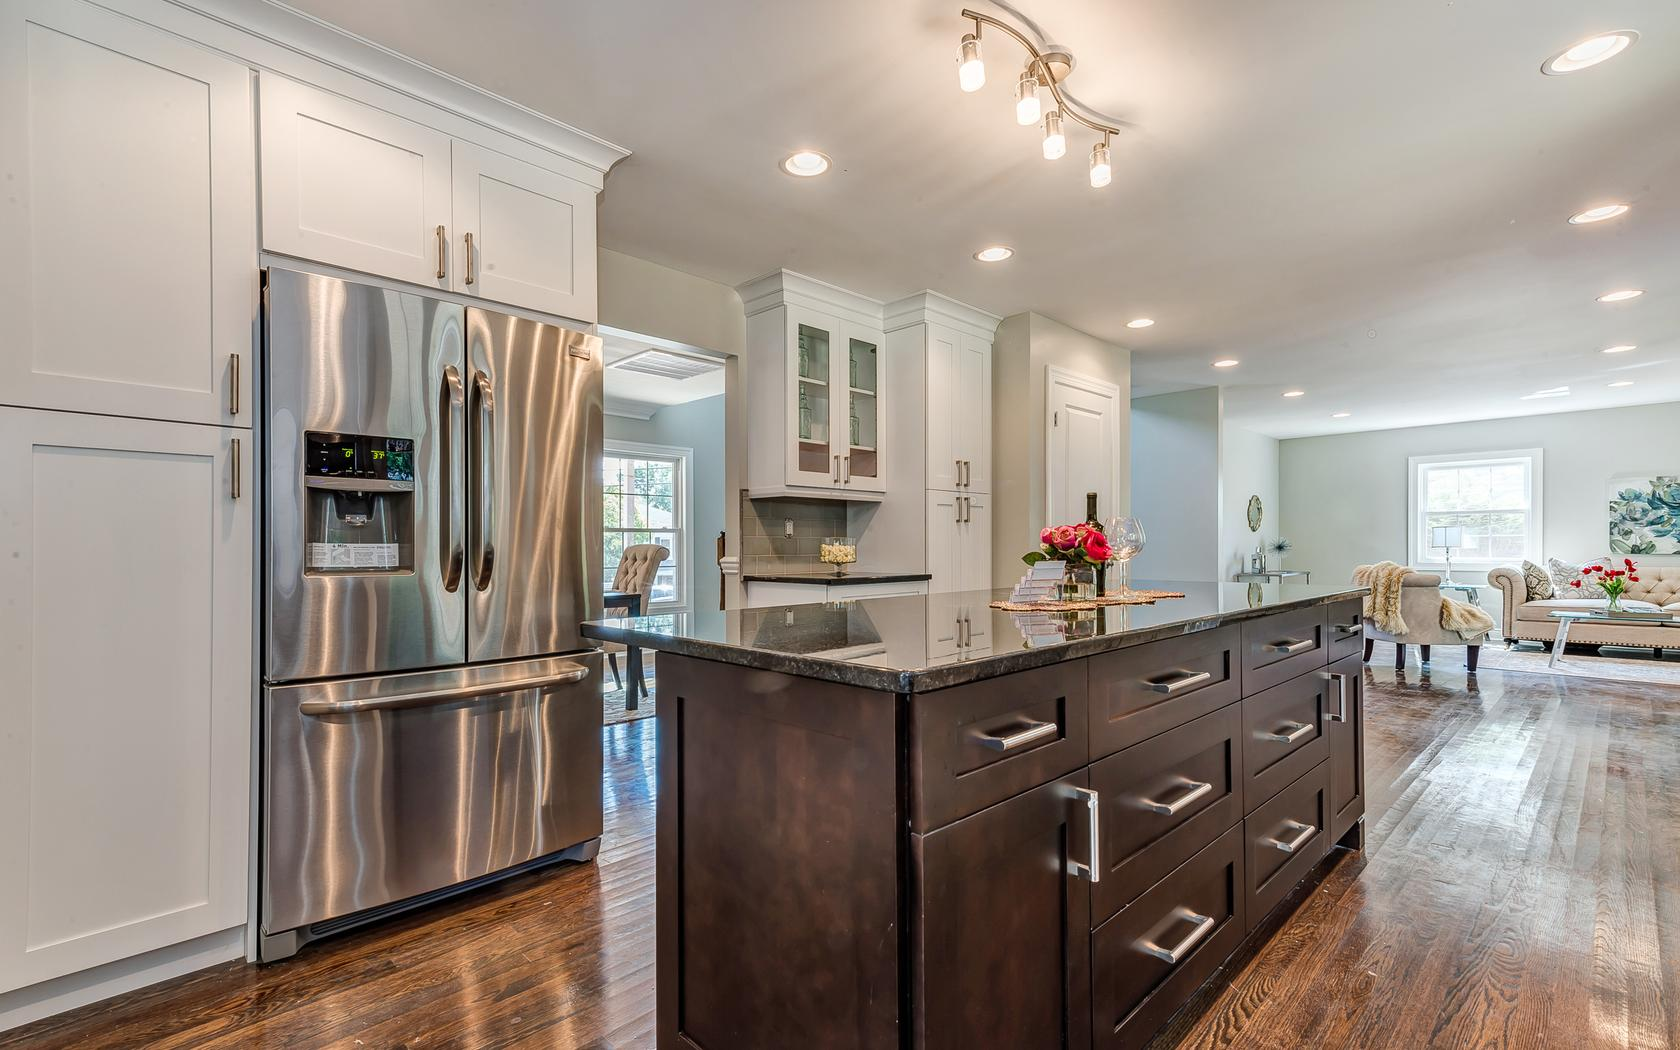 Kitchen cabinets northvale nj - Play Slideshow